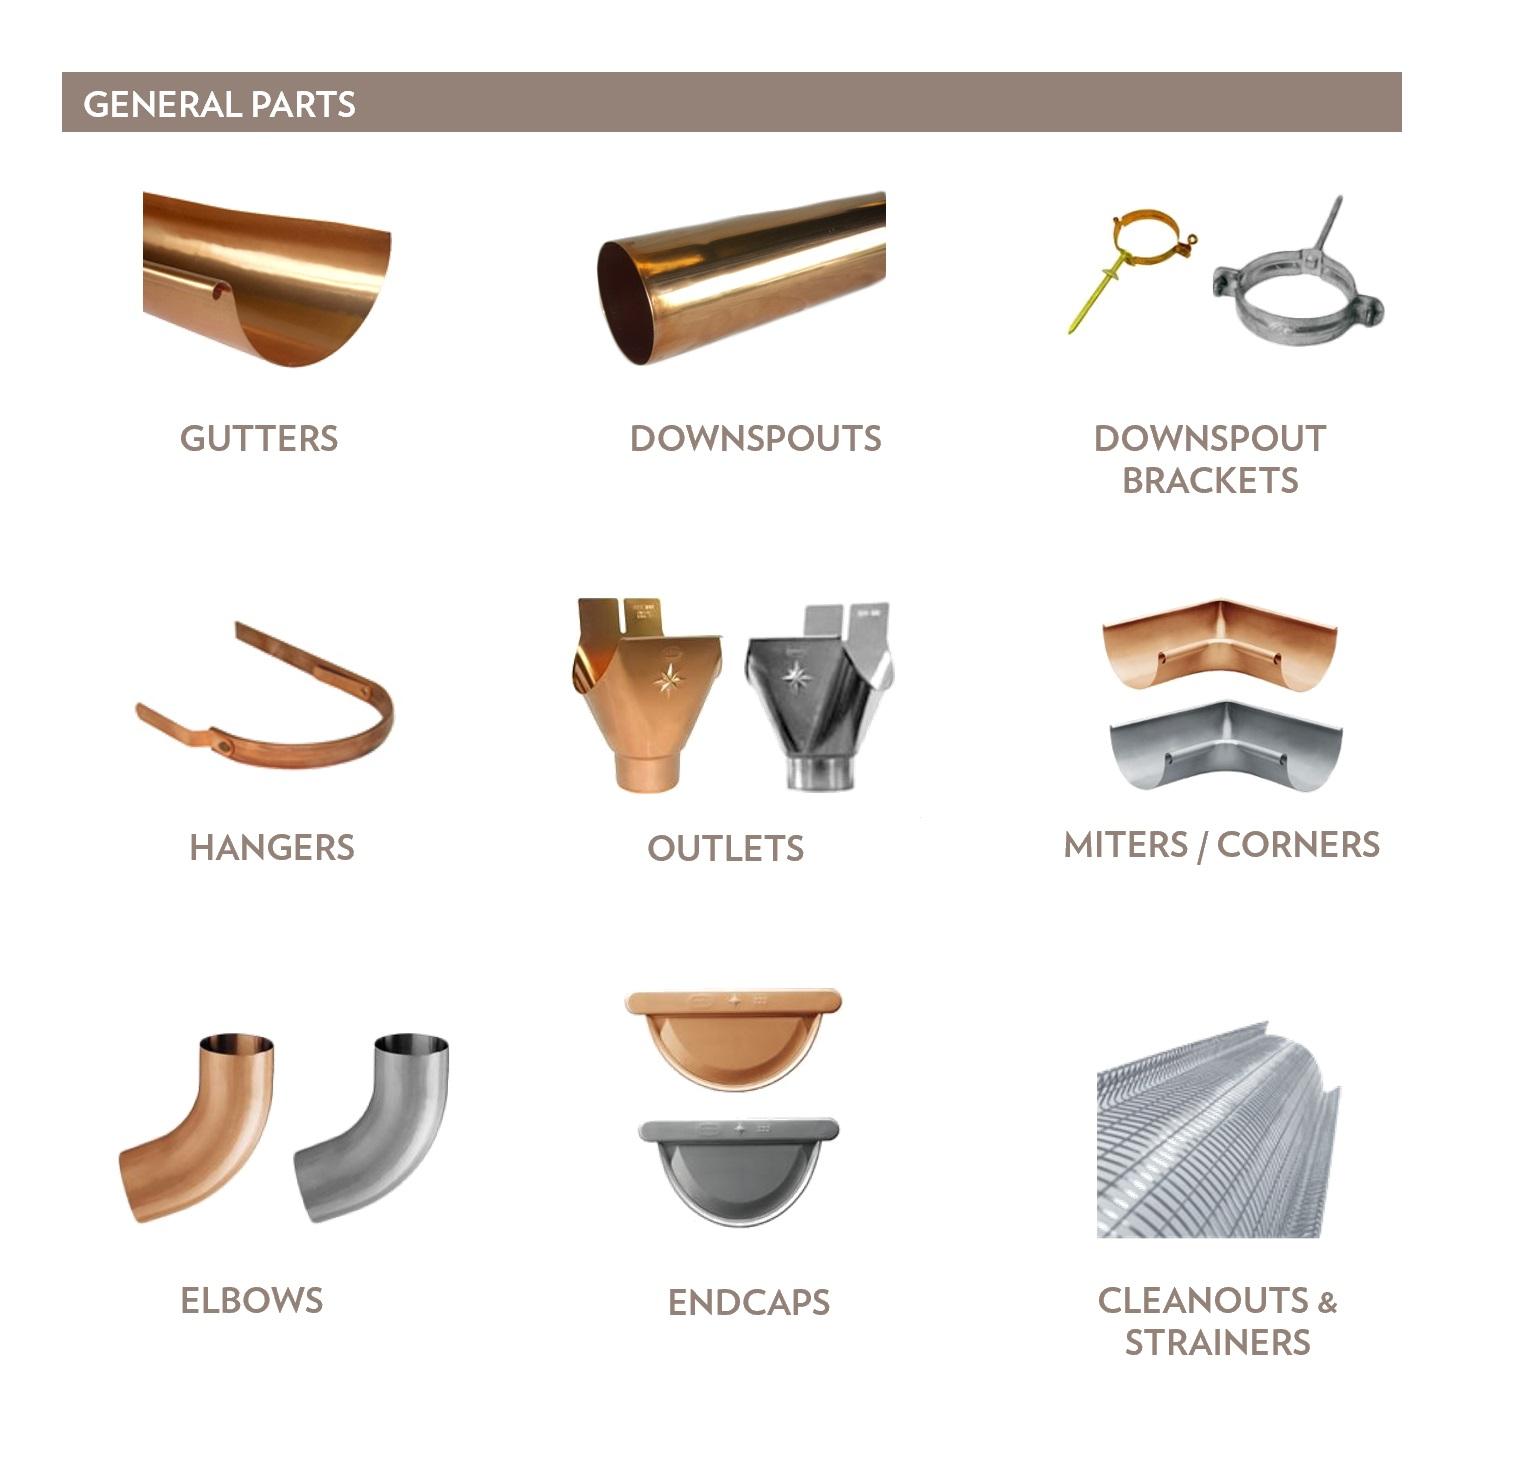 Rainwater Goods General Parts